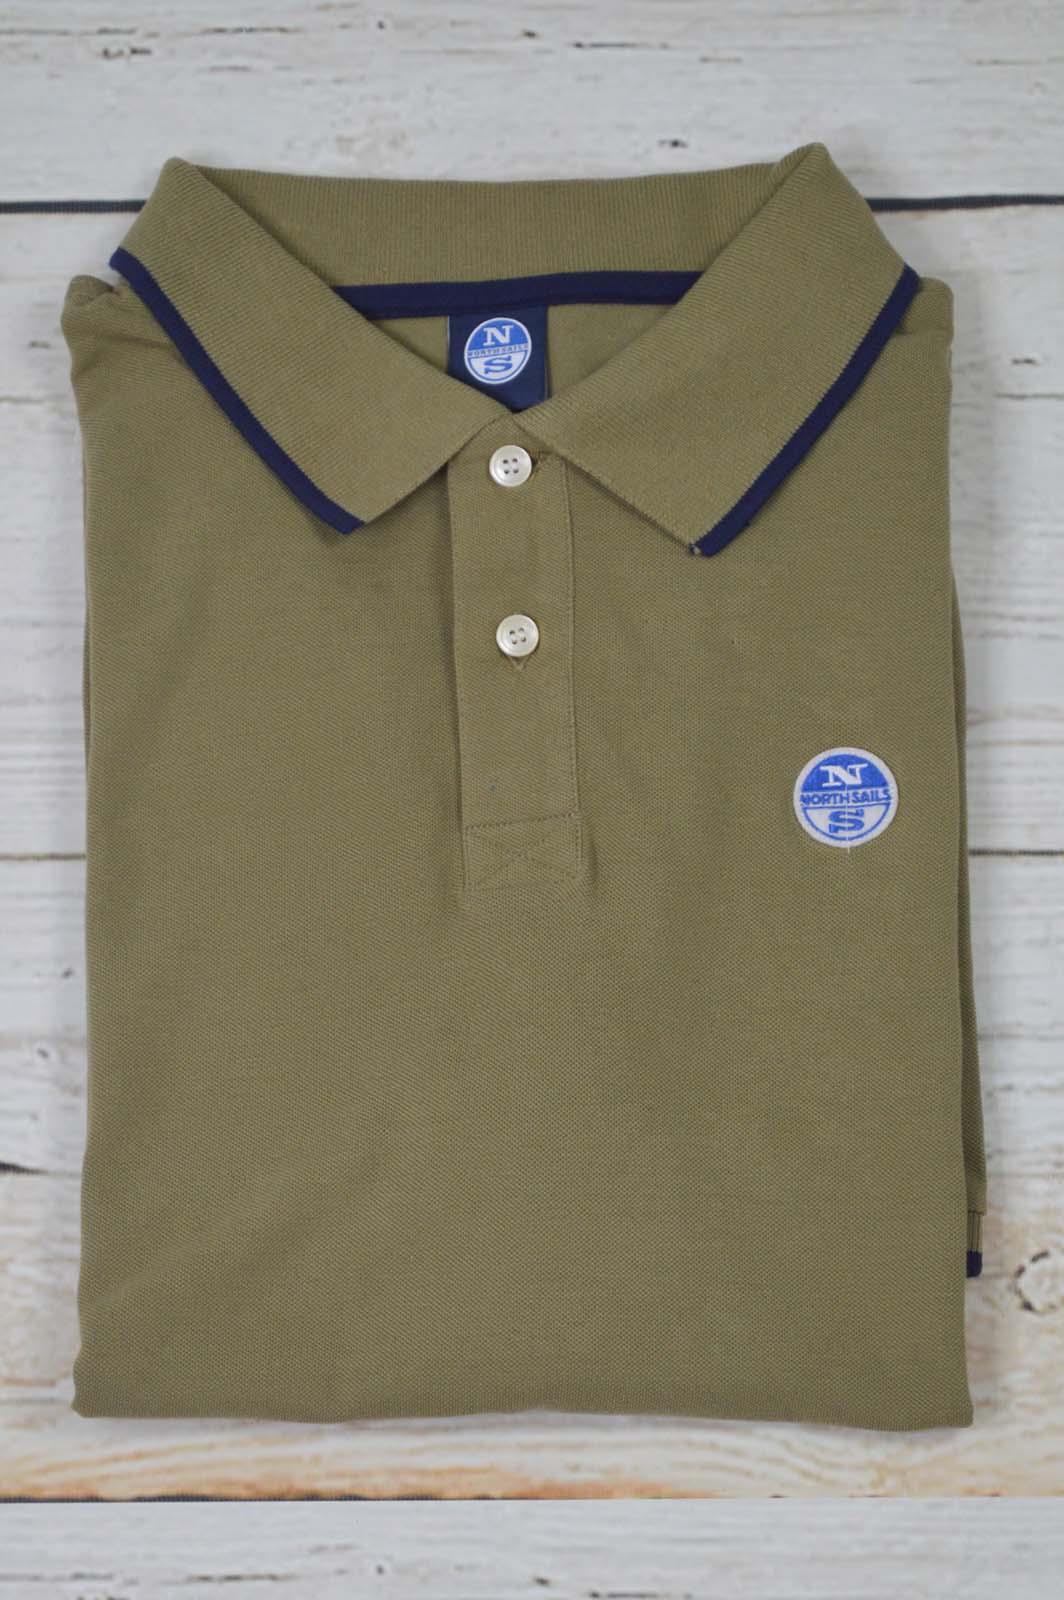 NORTH-SAILS-Mens-Legacy-Heritage-Short-Sleeve-Polo-Shirt-SALE-RRP-50 thumbnail 21